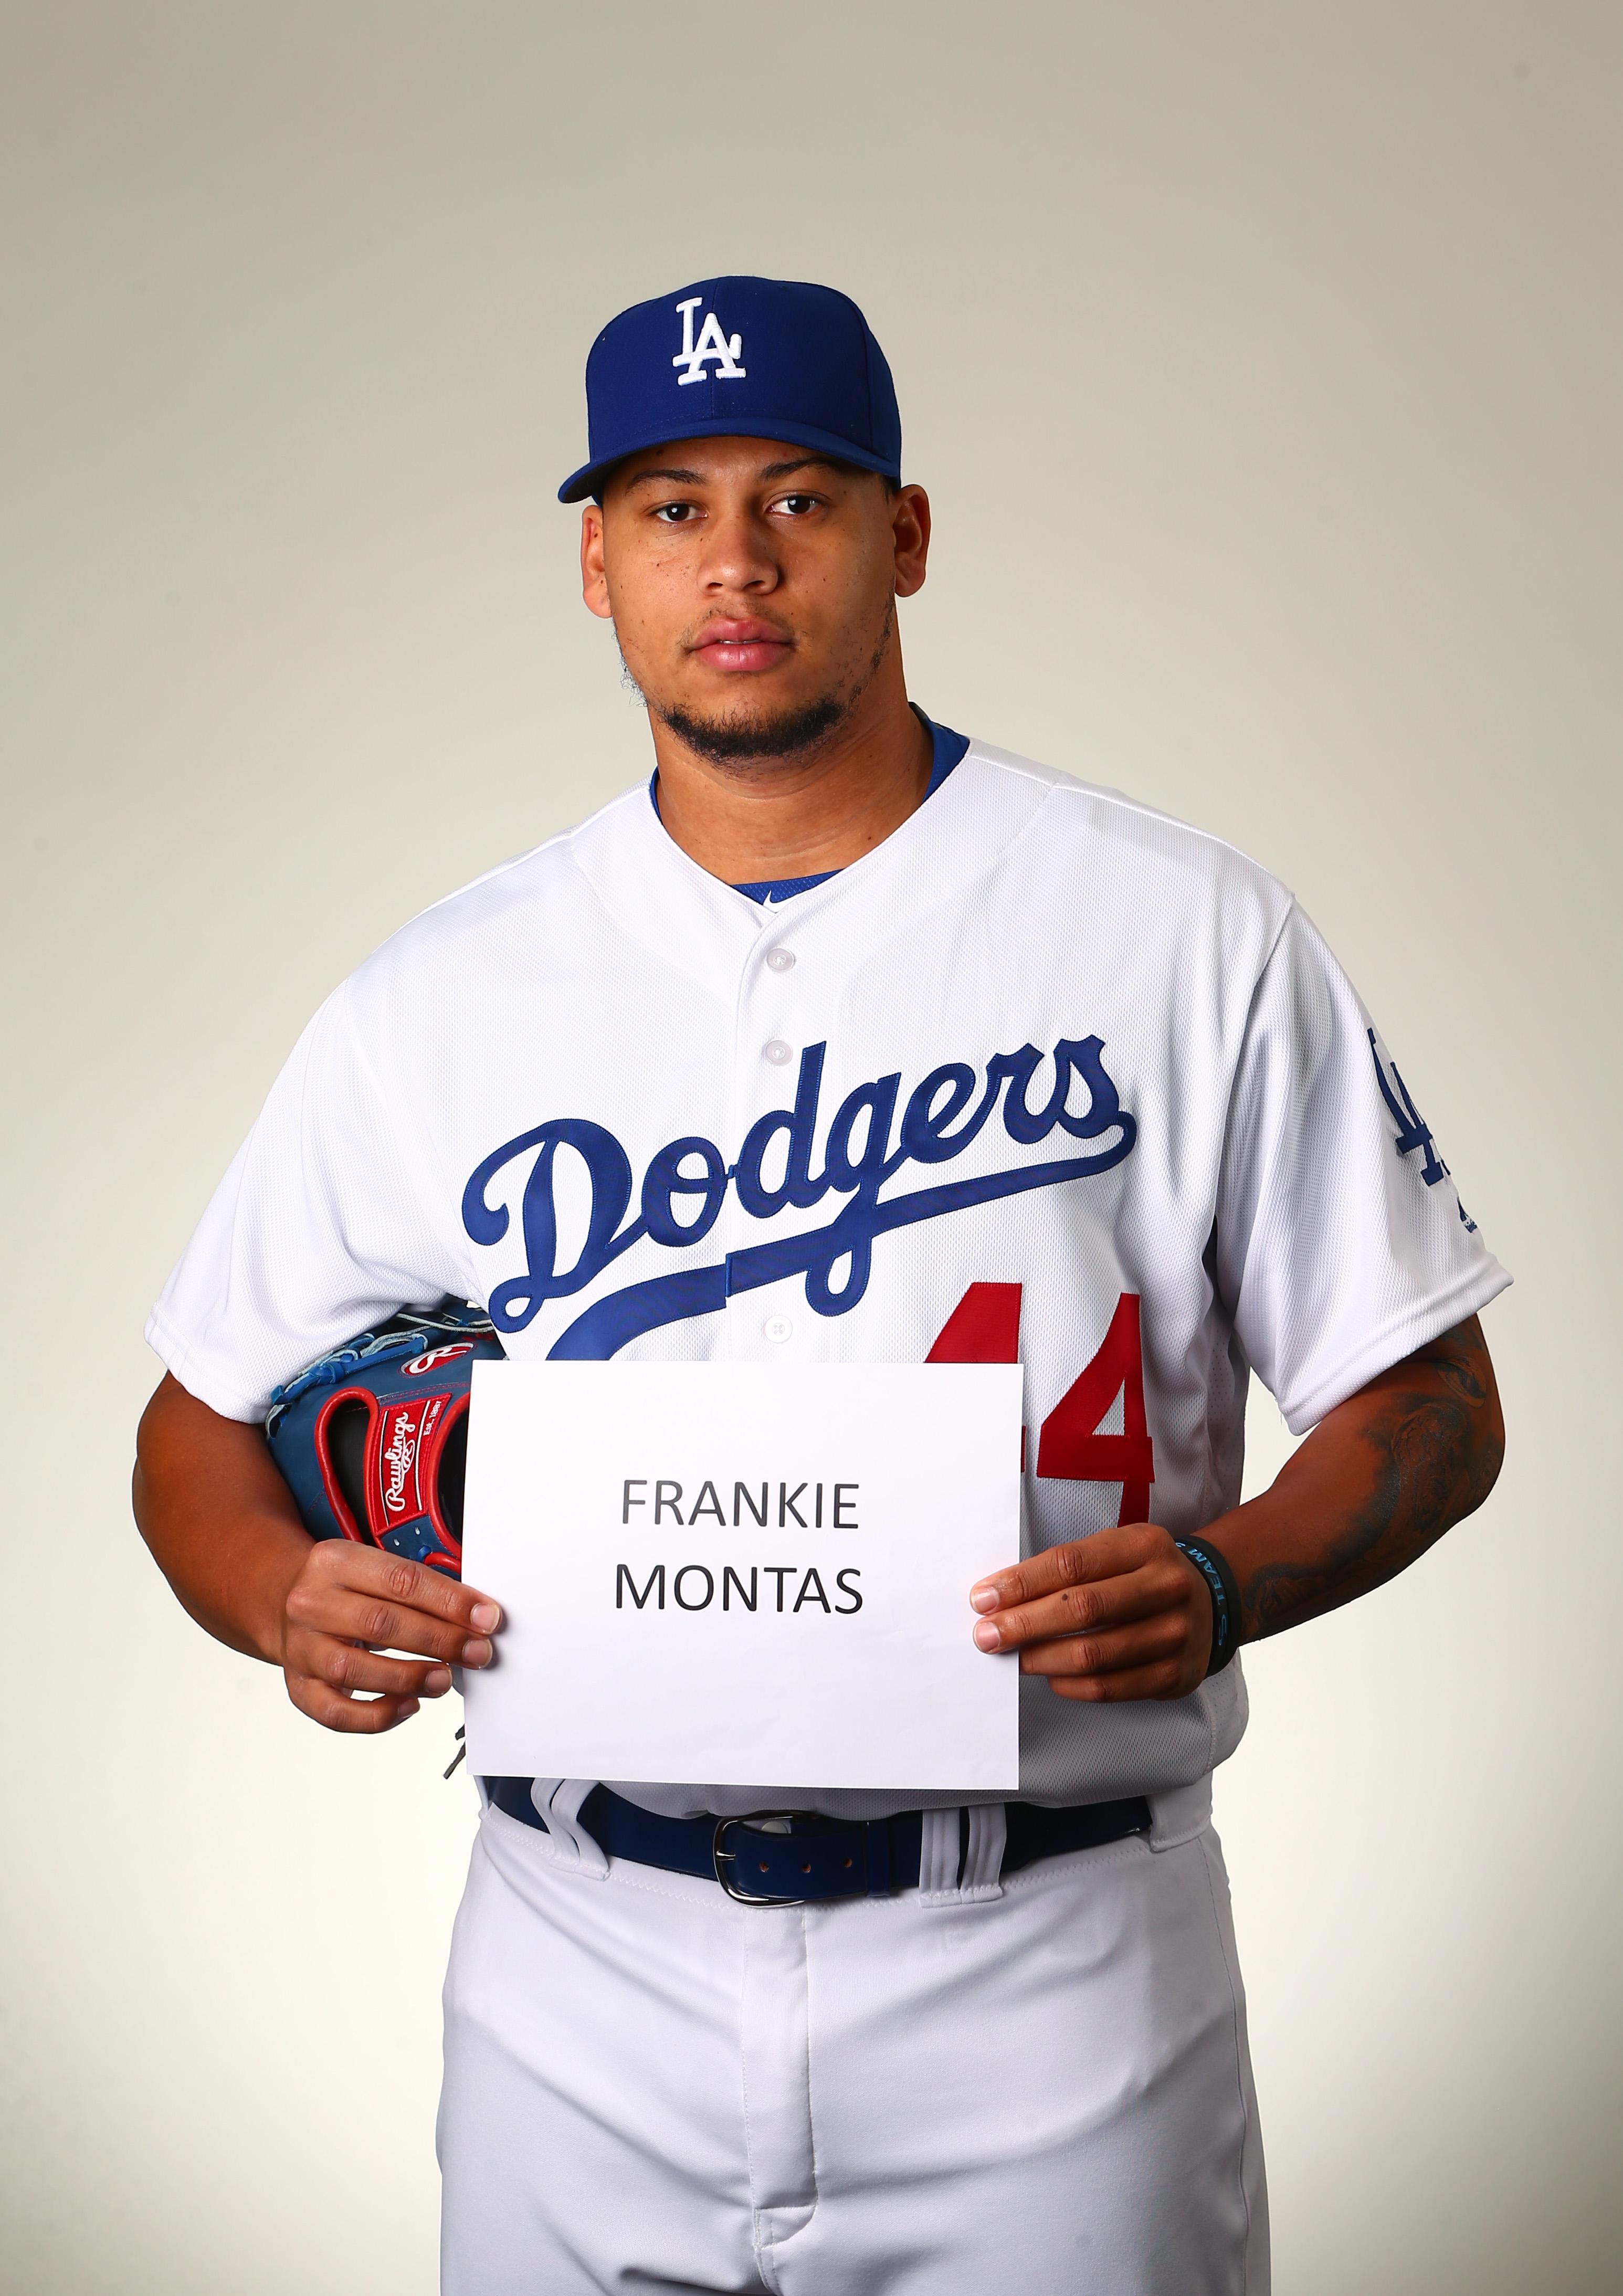 Patrick Schuster, Stetson Allie among Dodgers minor league signings - True Blue LA